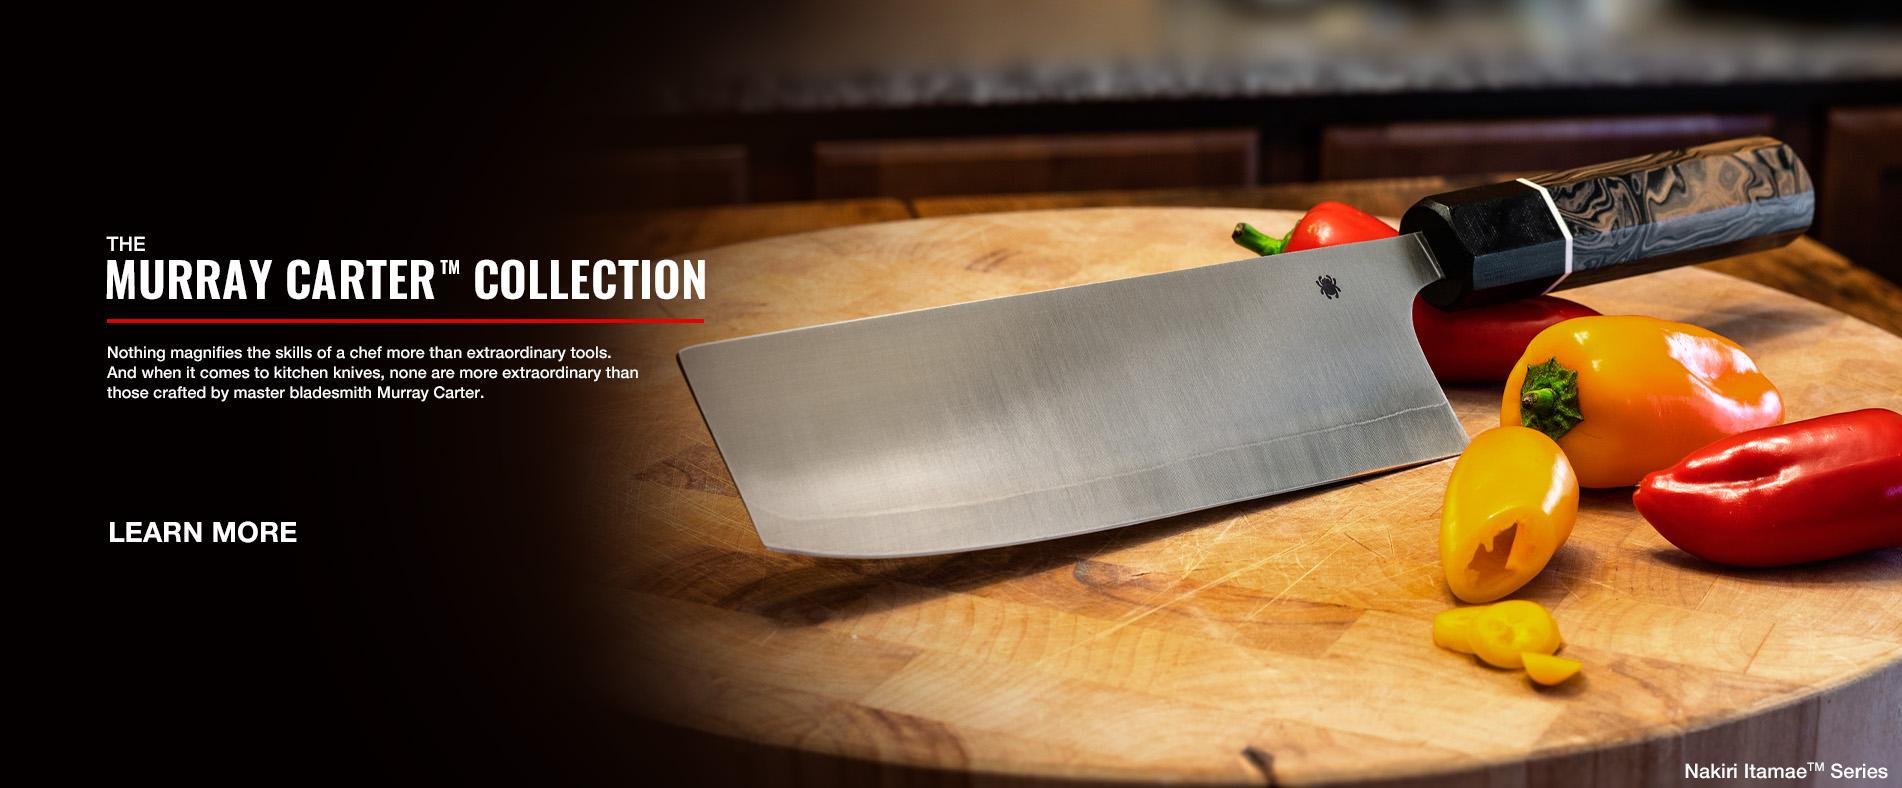 Spyderco Kitchen Classics